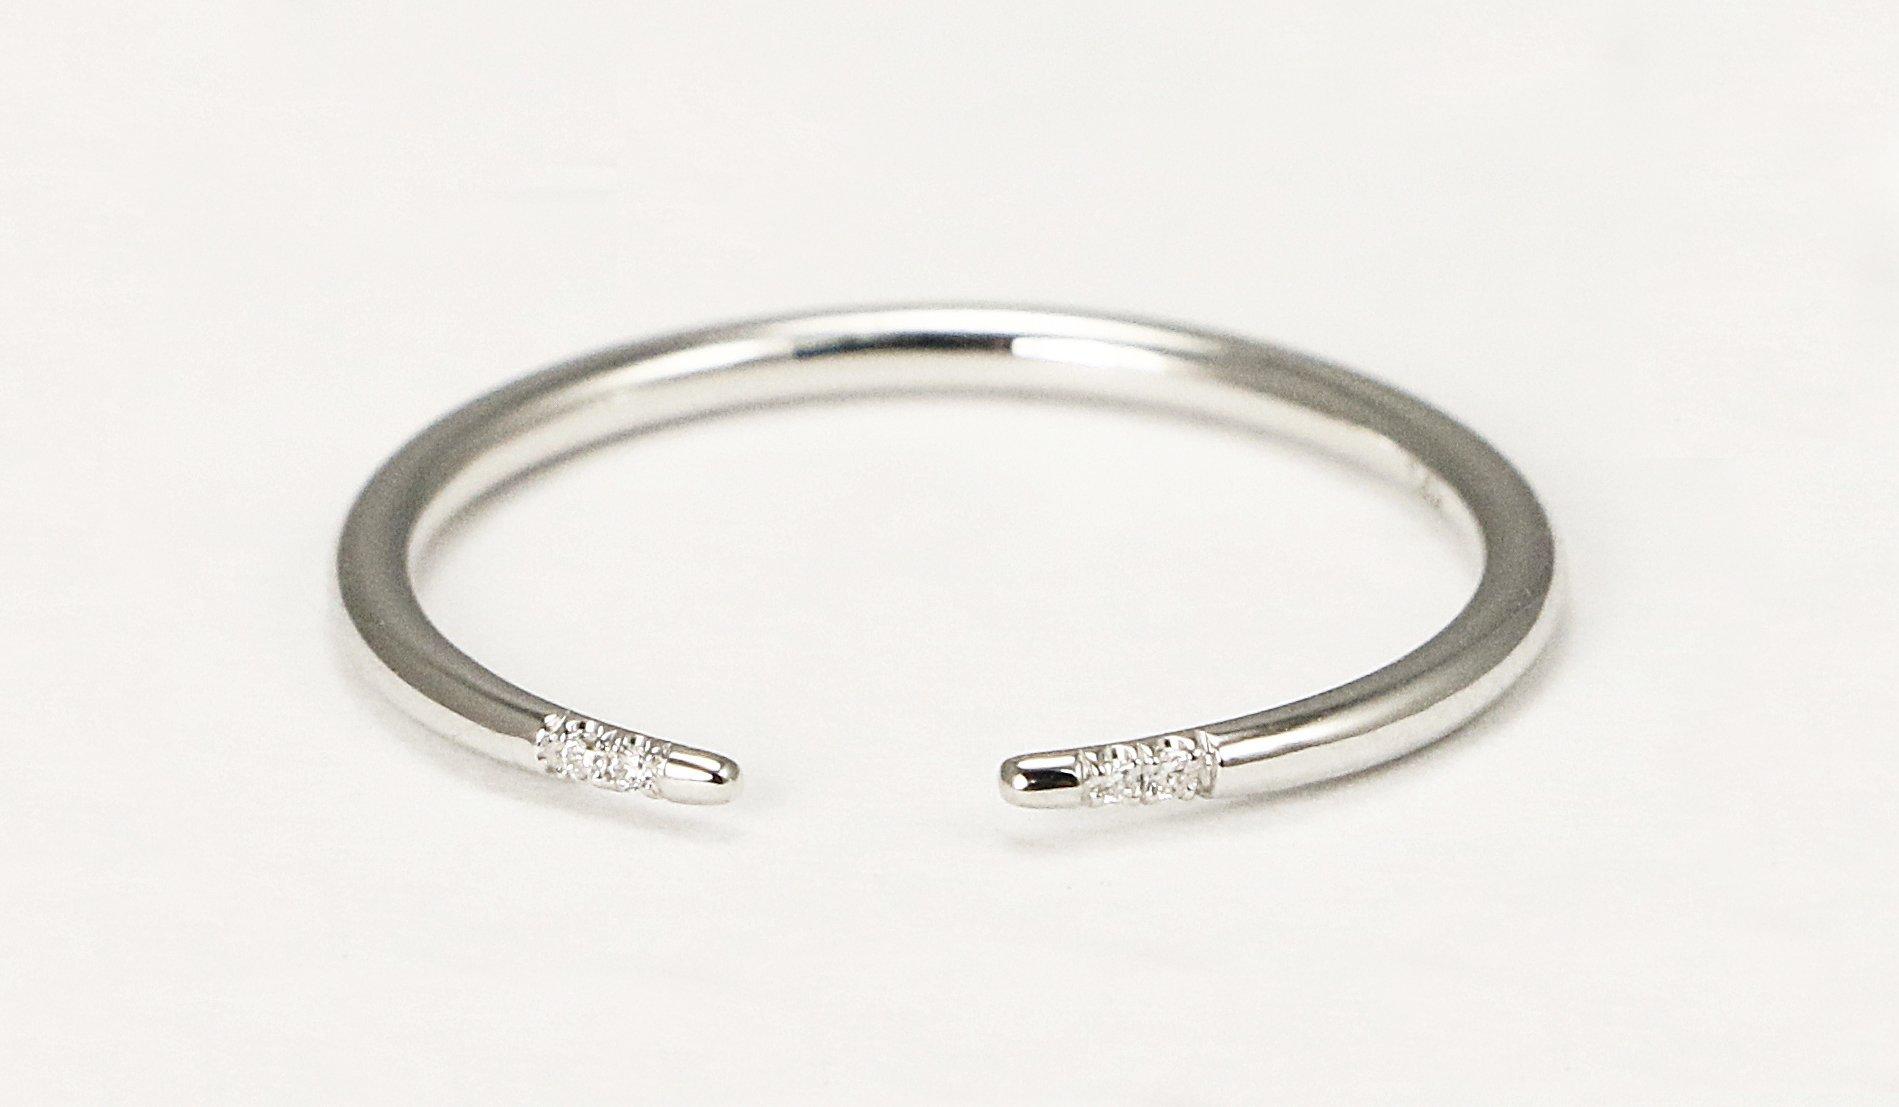 14k White Gold Diamond Wedding Band, White Gold Diamond Stacking Ring